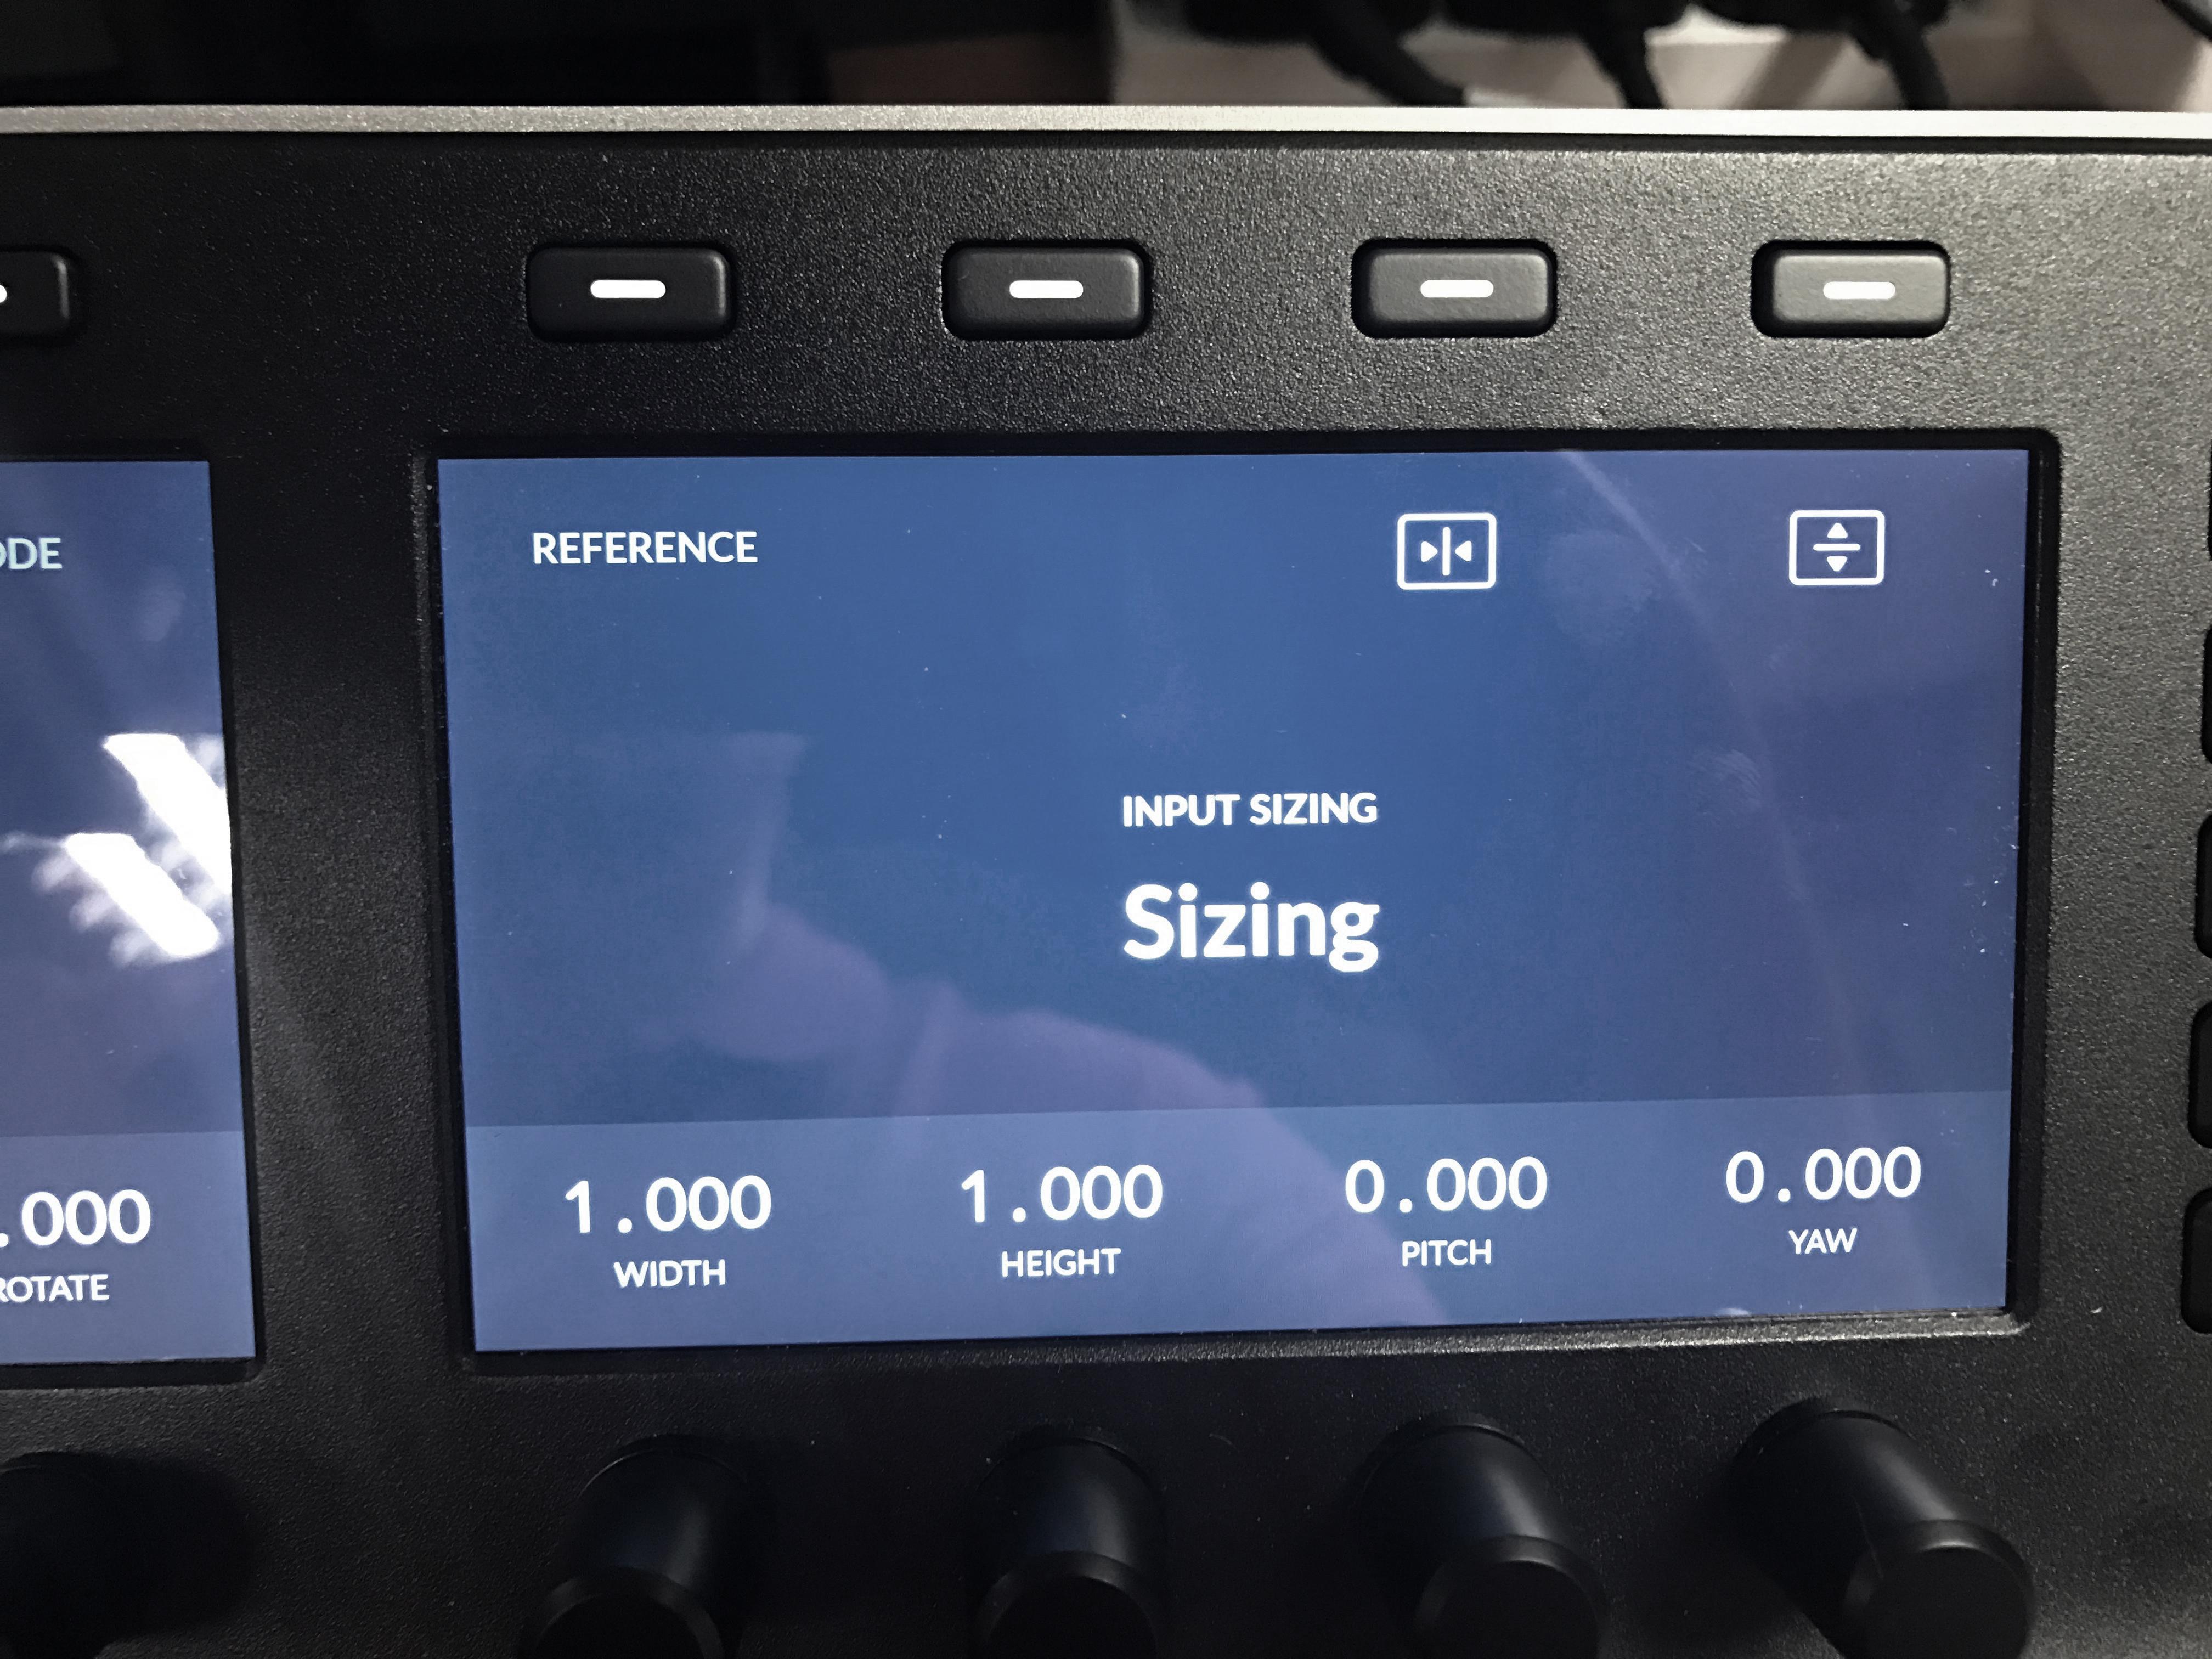 The sizing menu in the DaVinci Resolve Mini Panel